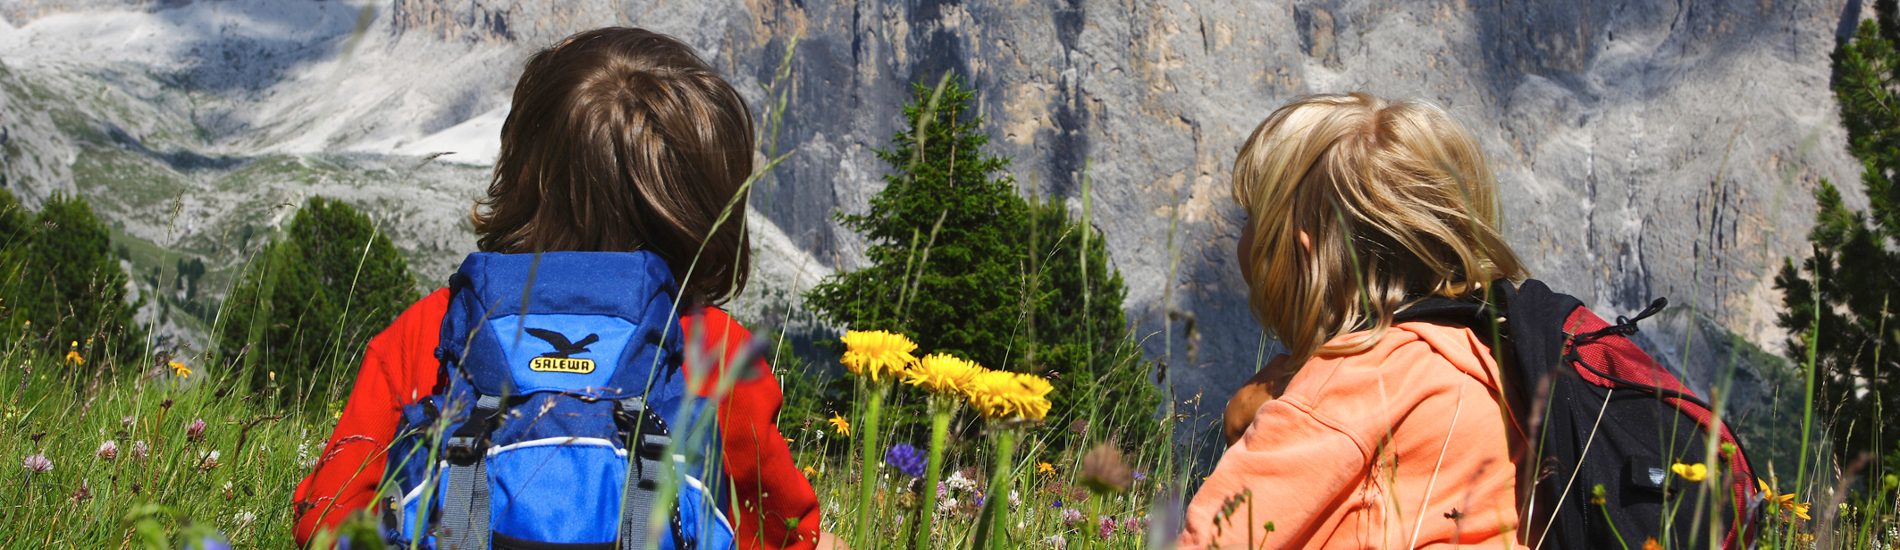 Bambini in Vacanza in Trentino